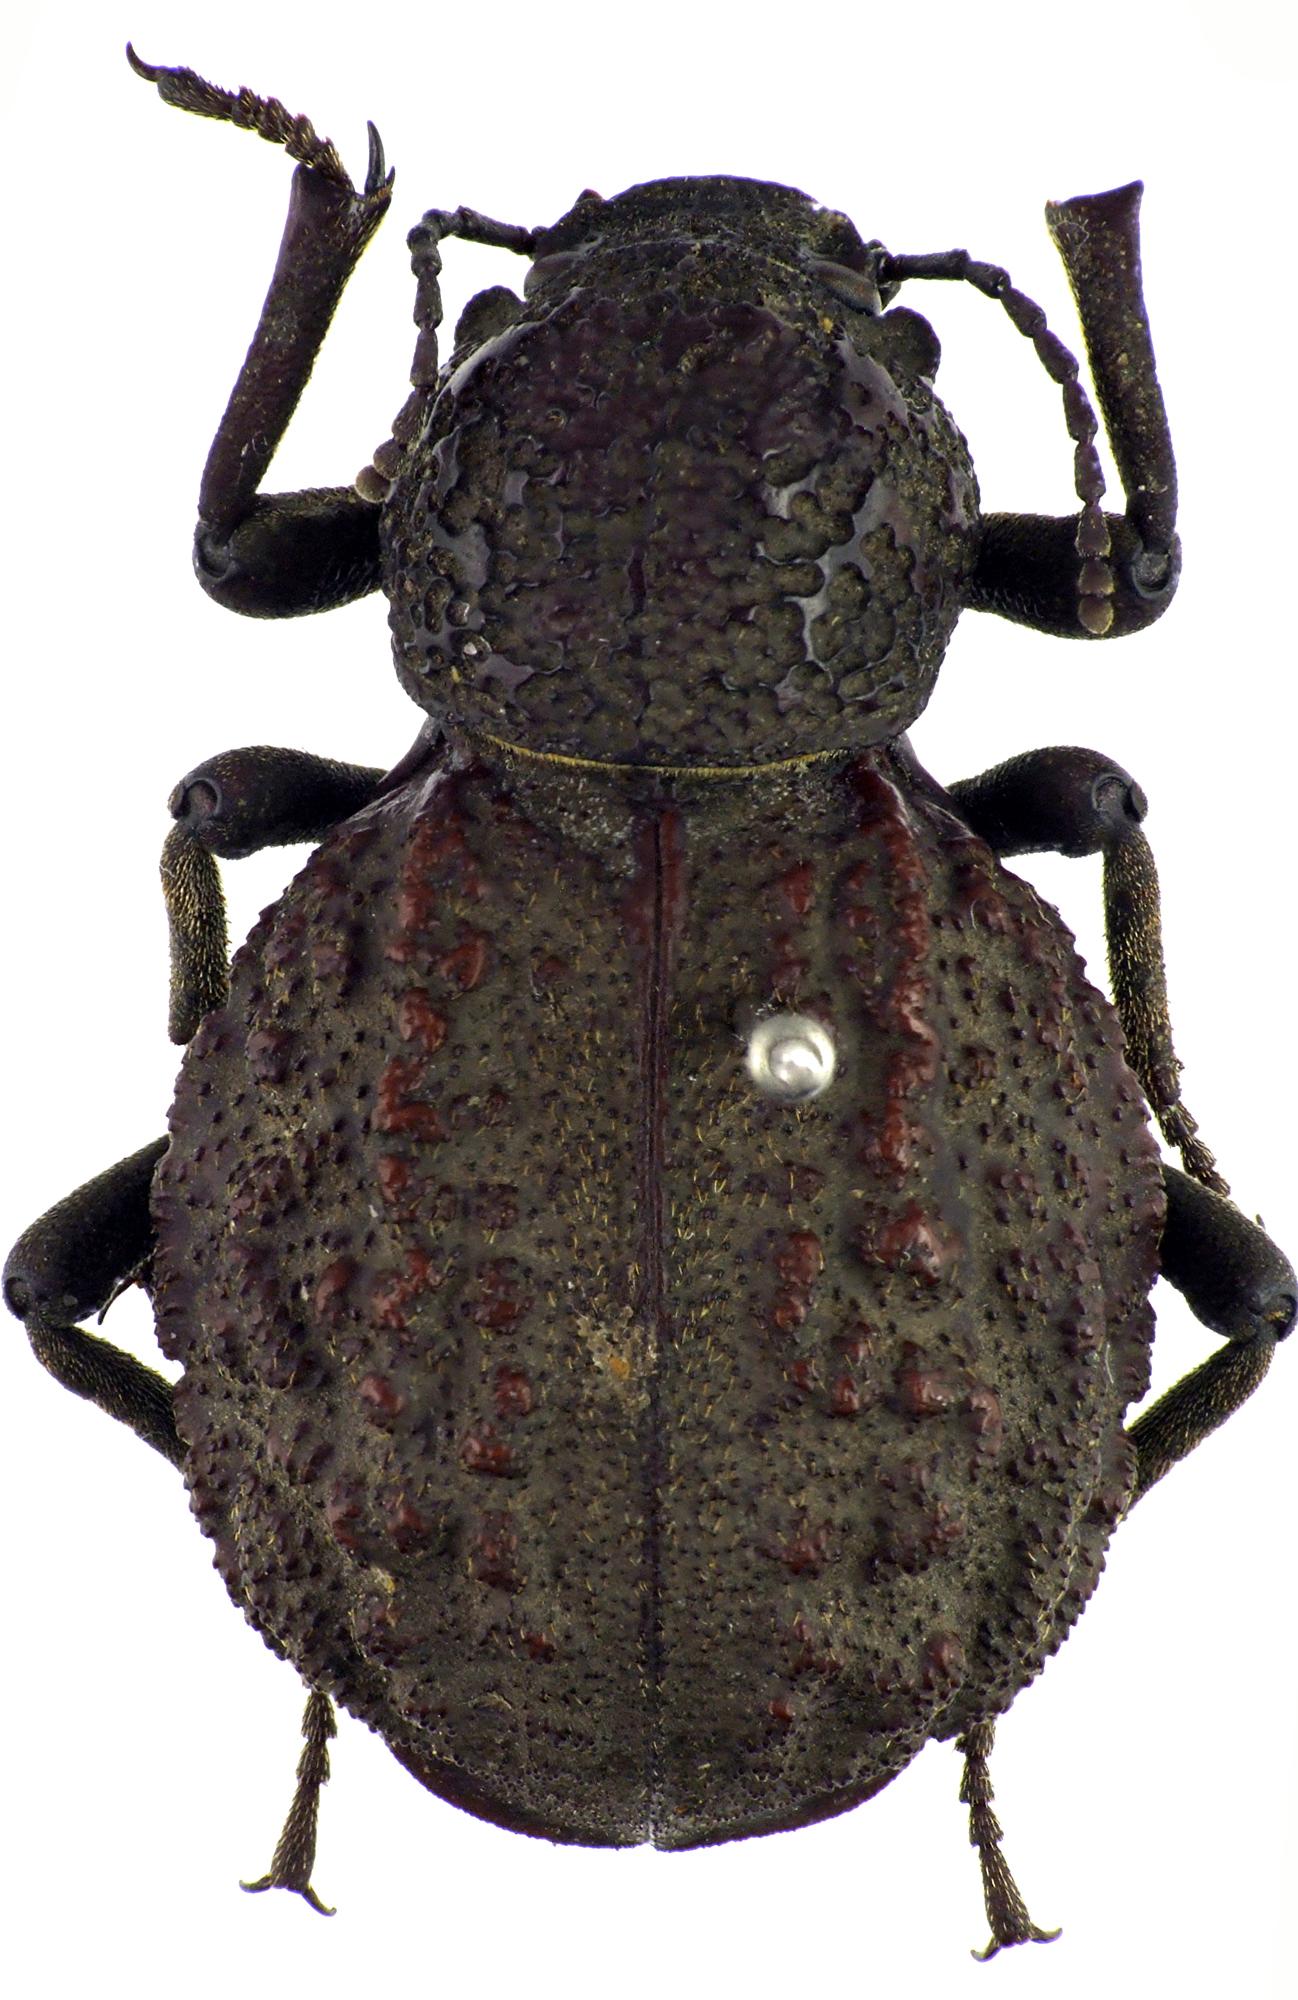 Physophrynus bredoi PT f NM64348cz59.jpg